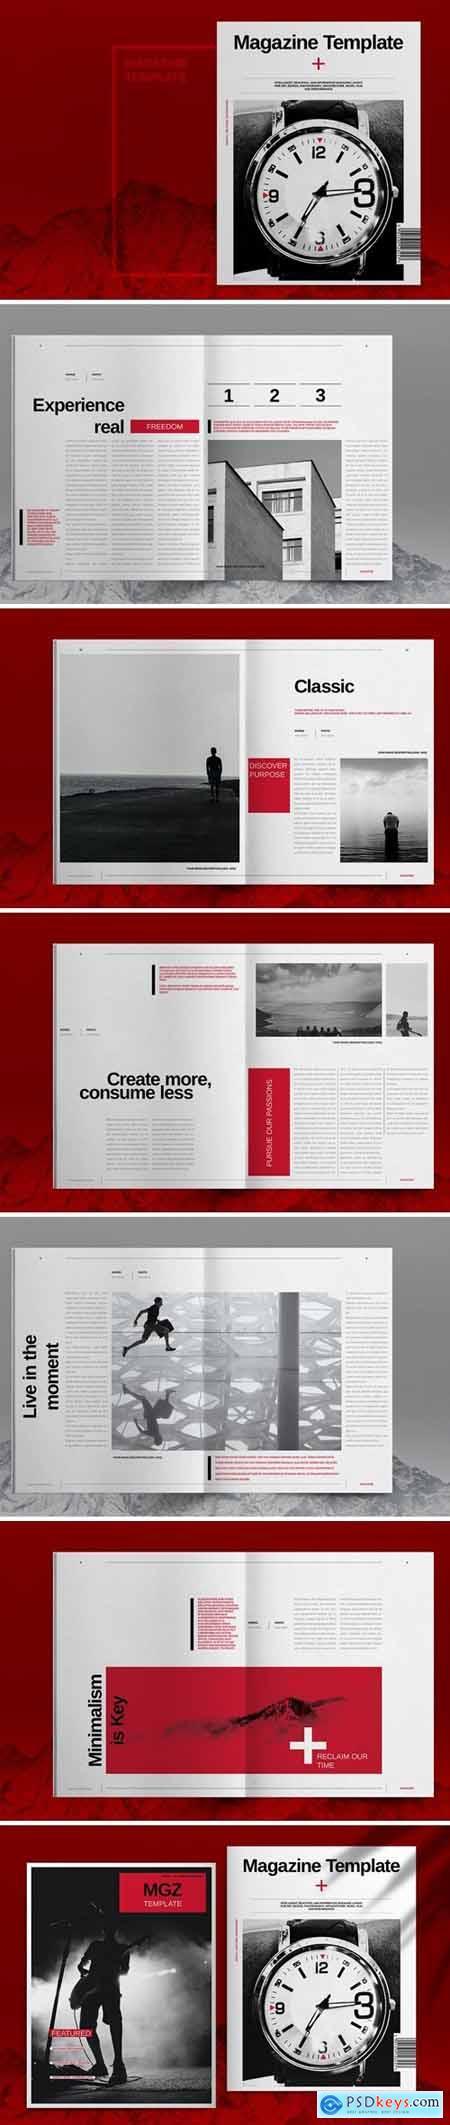 Swiss Style Magazine Template